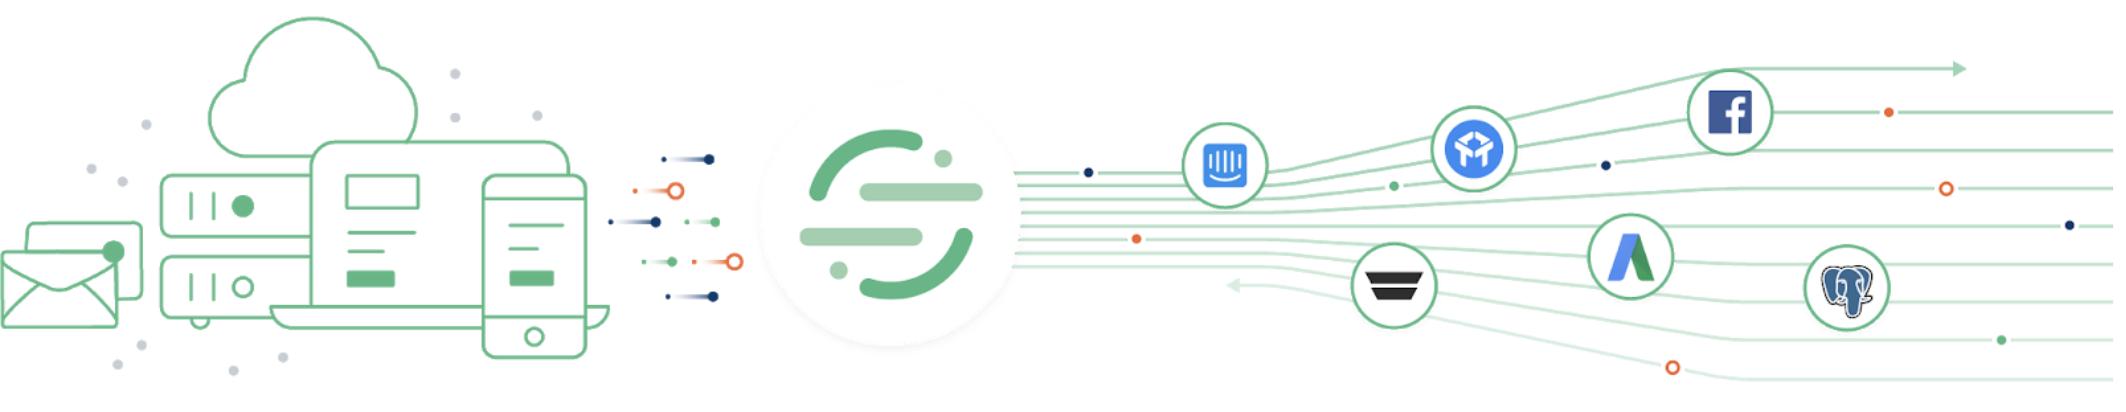 recoger_sintetizar_utilizar-segment